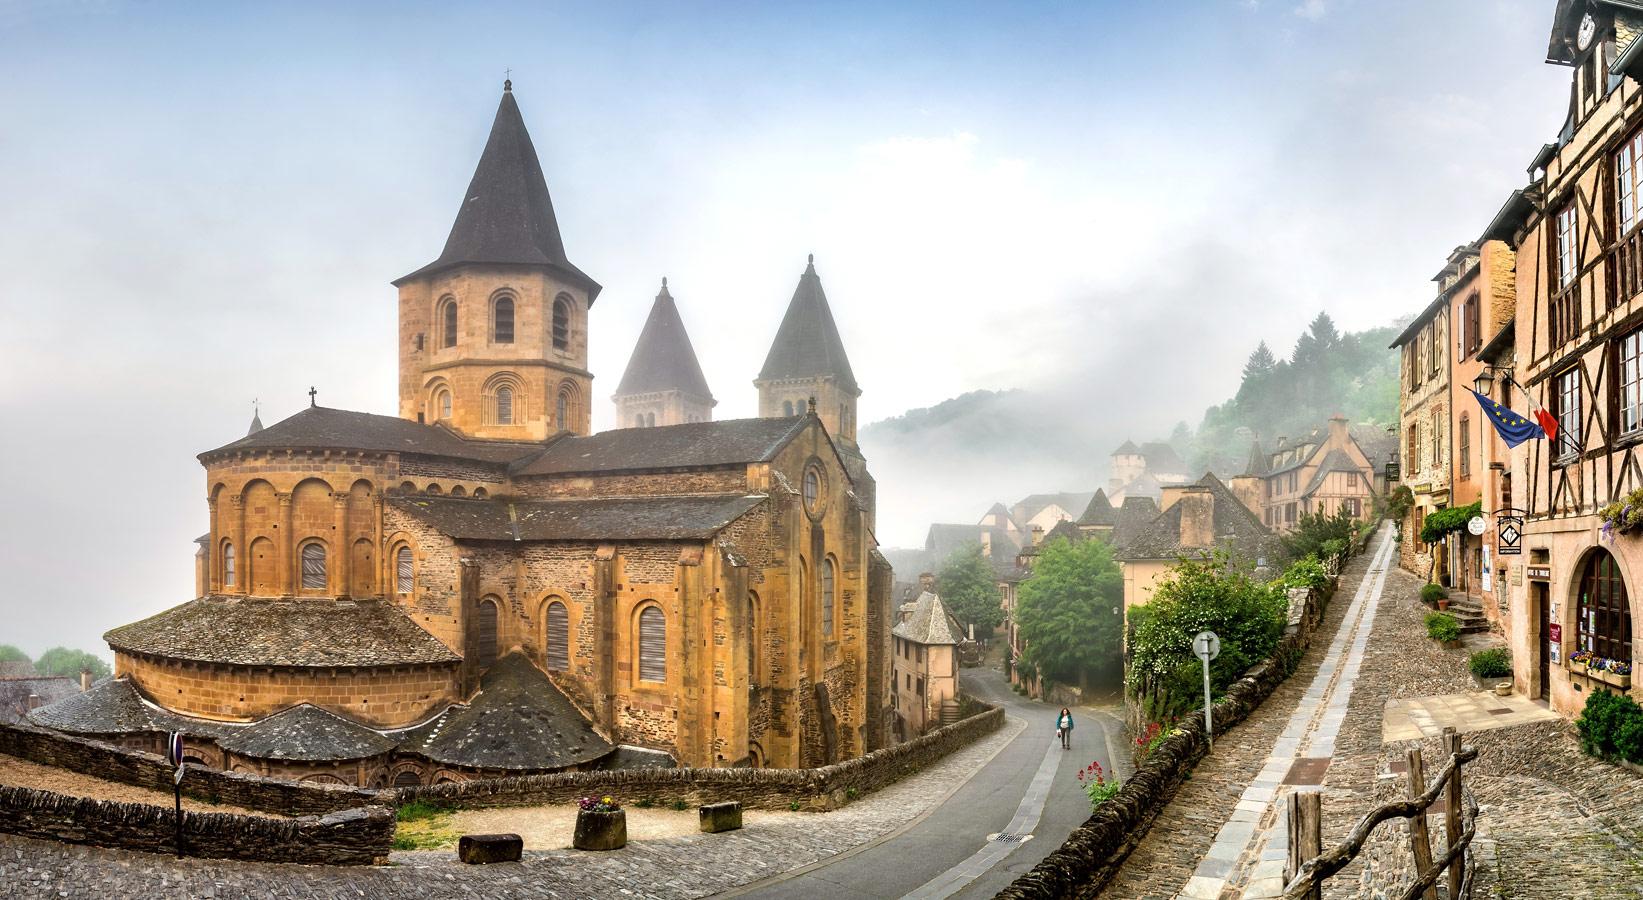 © Кшиштоф Голик, 12-е место, Фотоконкурс «Вики любит памятники» — Wiki Loves Monuments